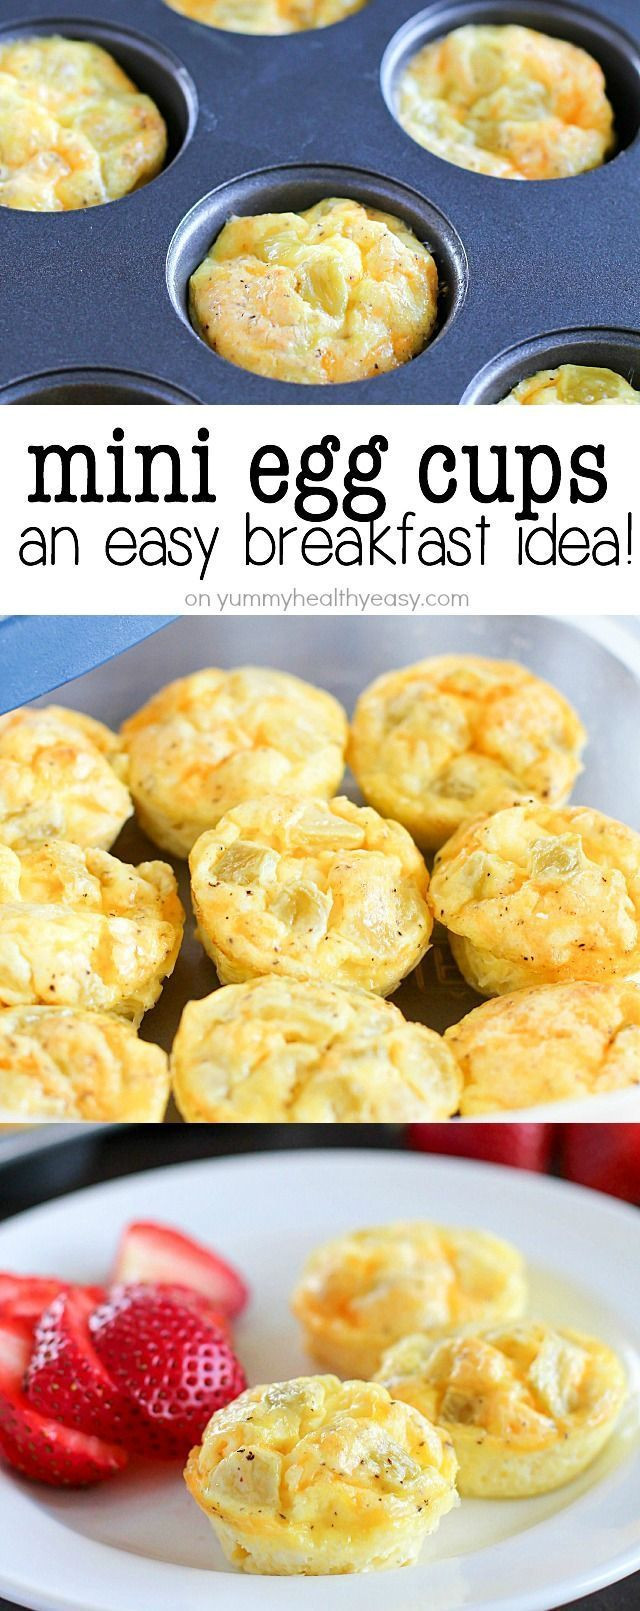 Delicious Healthy Breakfast Recipes  17 Best ideas about Pregnancy Breakfast on Pinterest